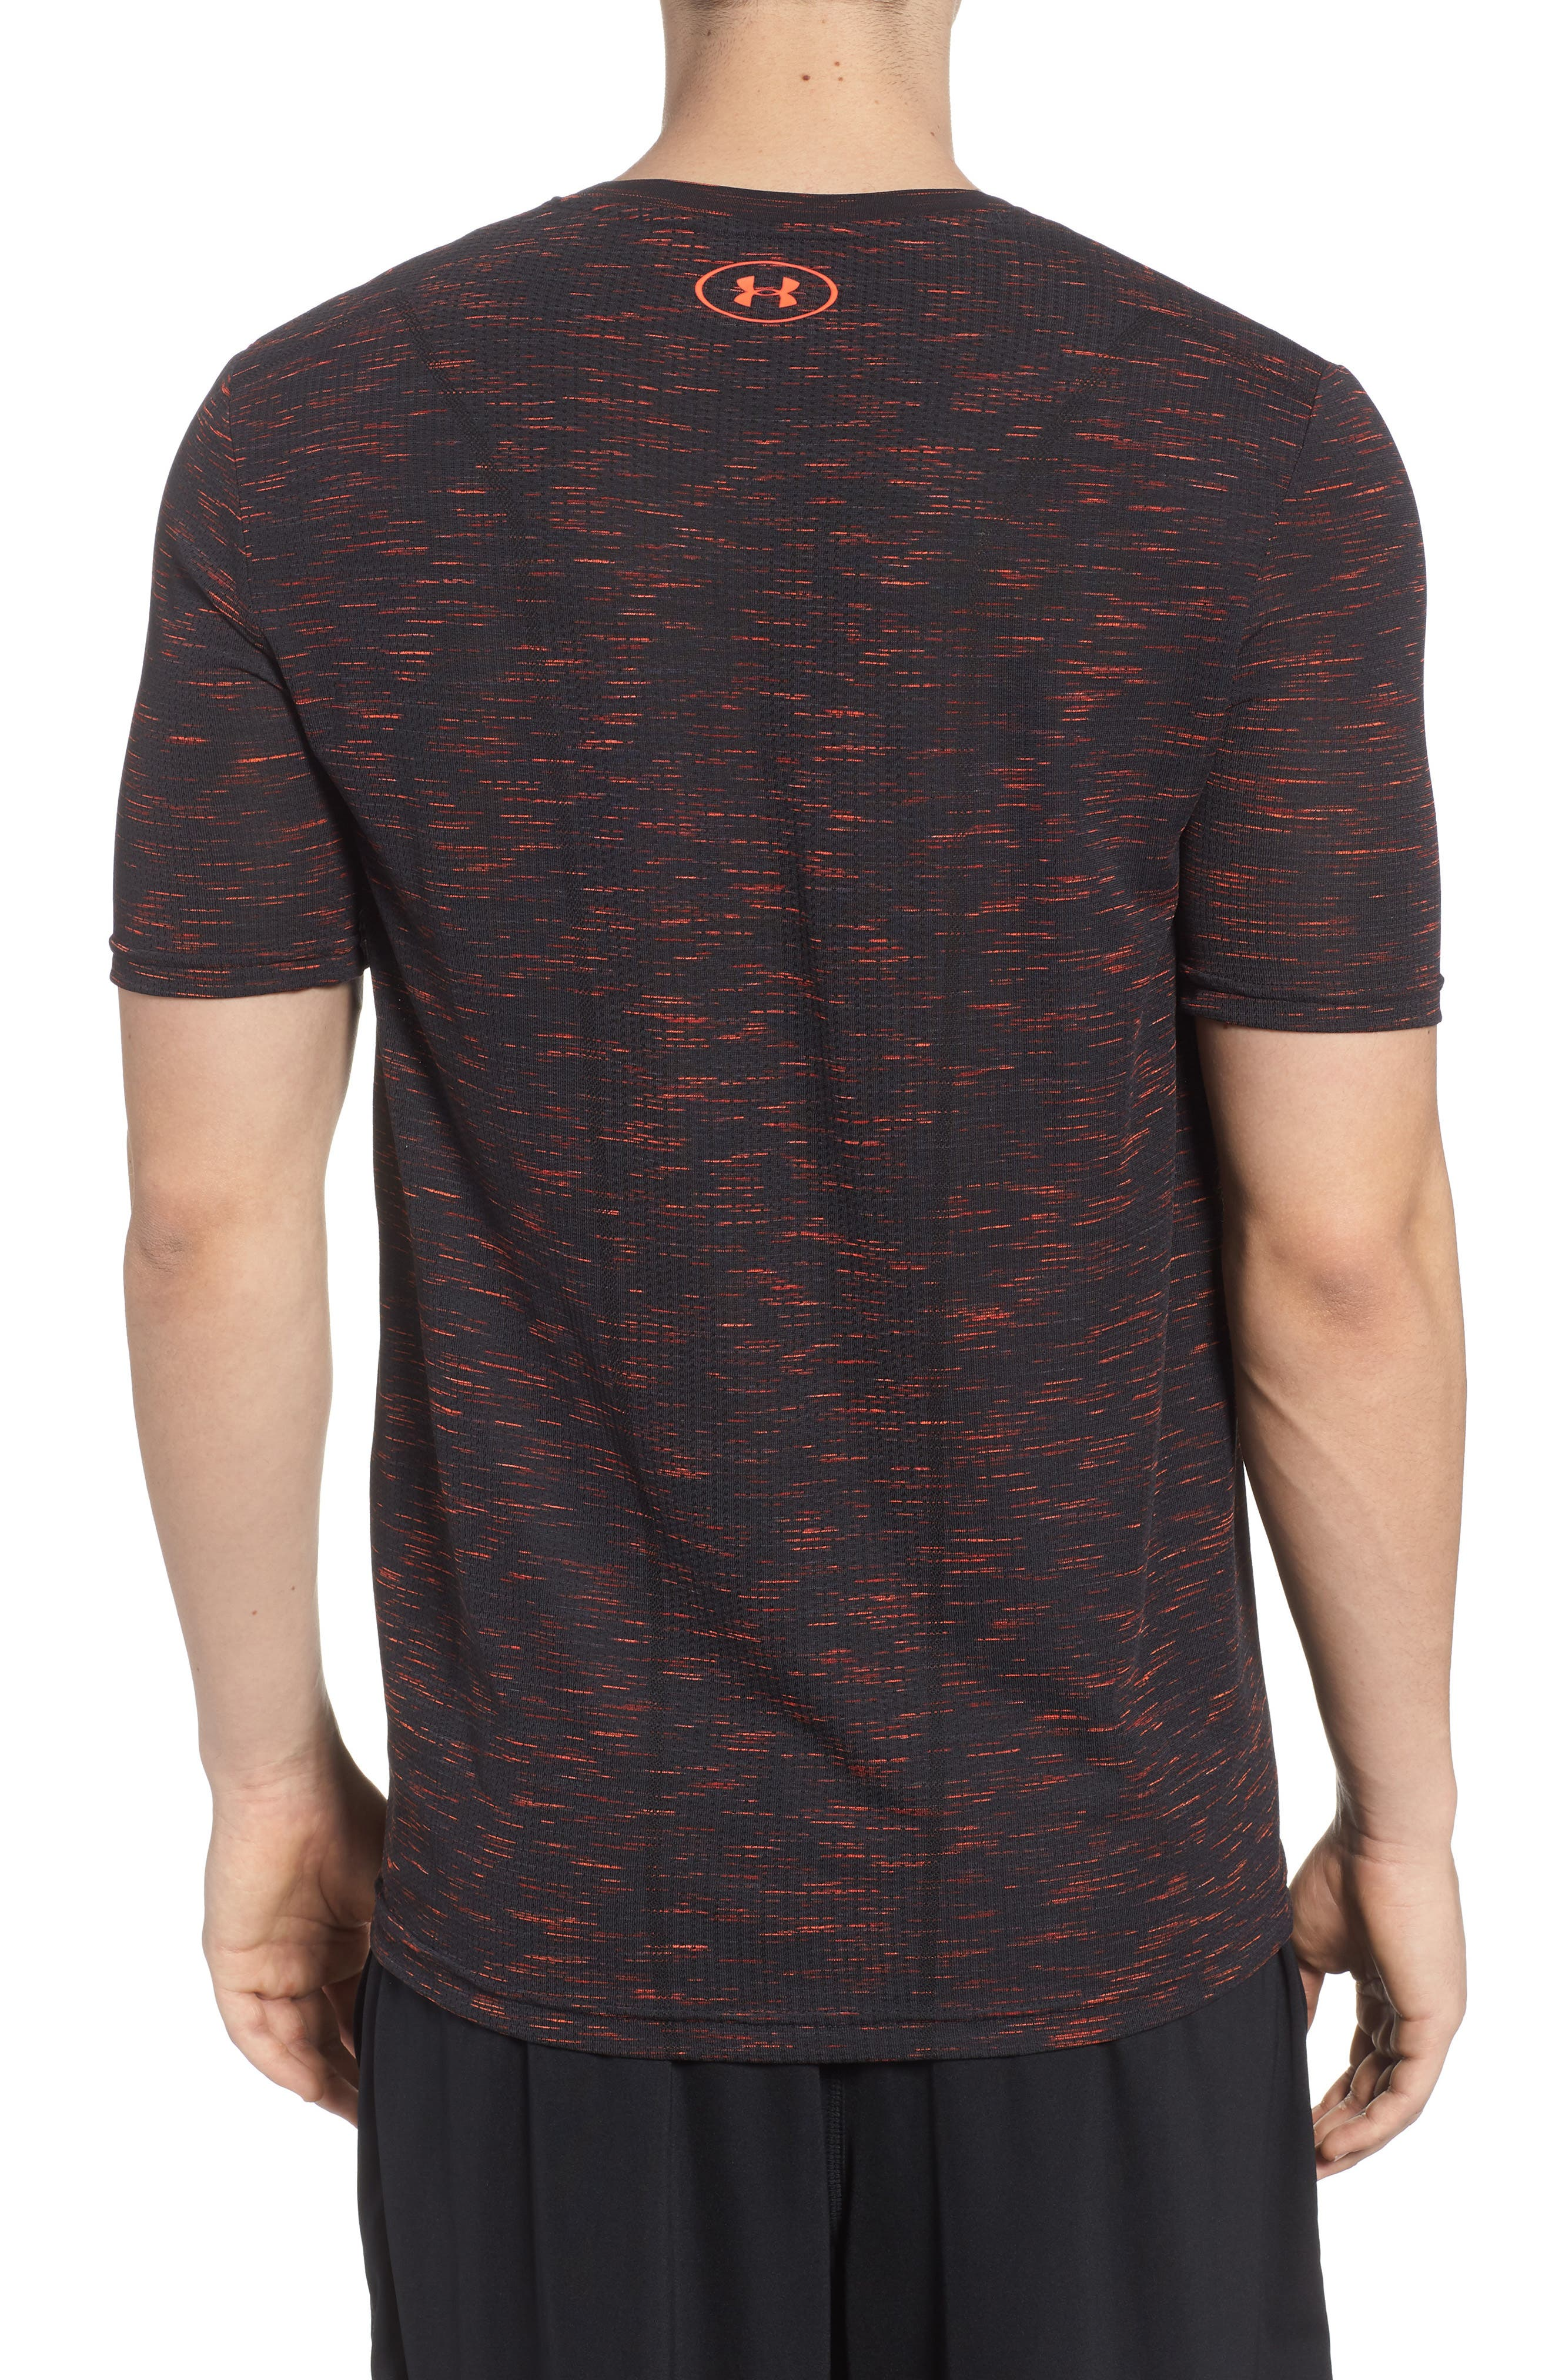 Threadborne Regular Fit T-Shirt,                             Alternate thumbnail 2, color,                             ANTHRACITE/ NEON CORAL